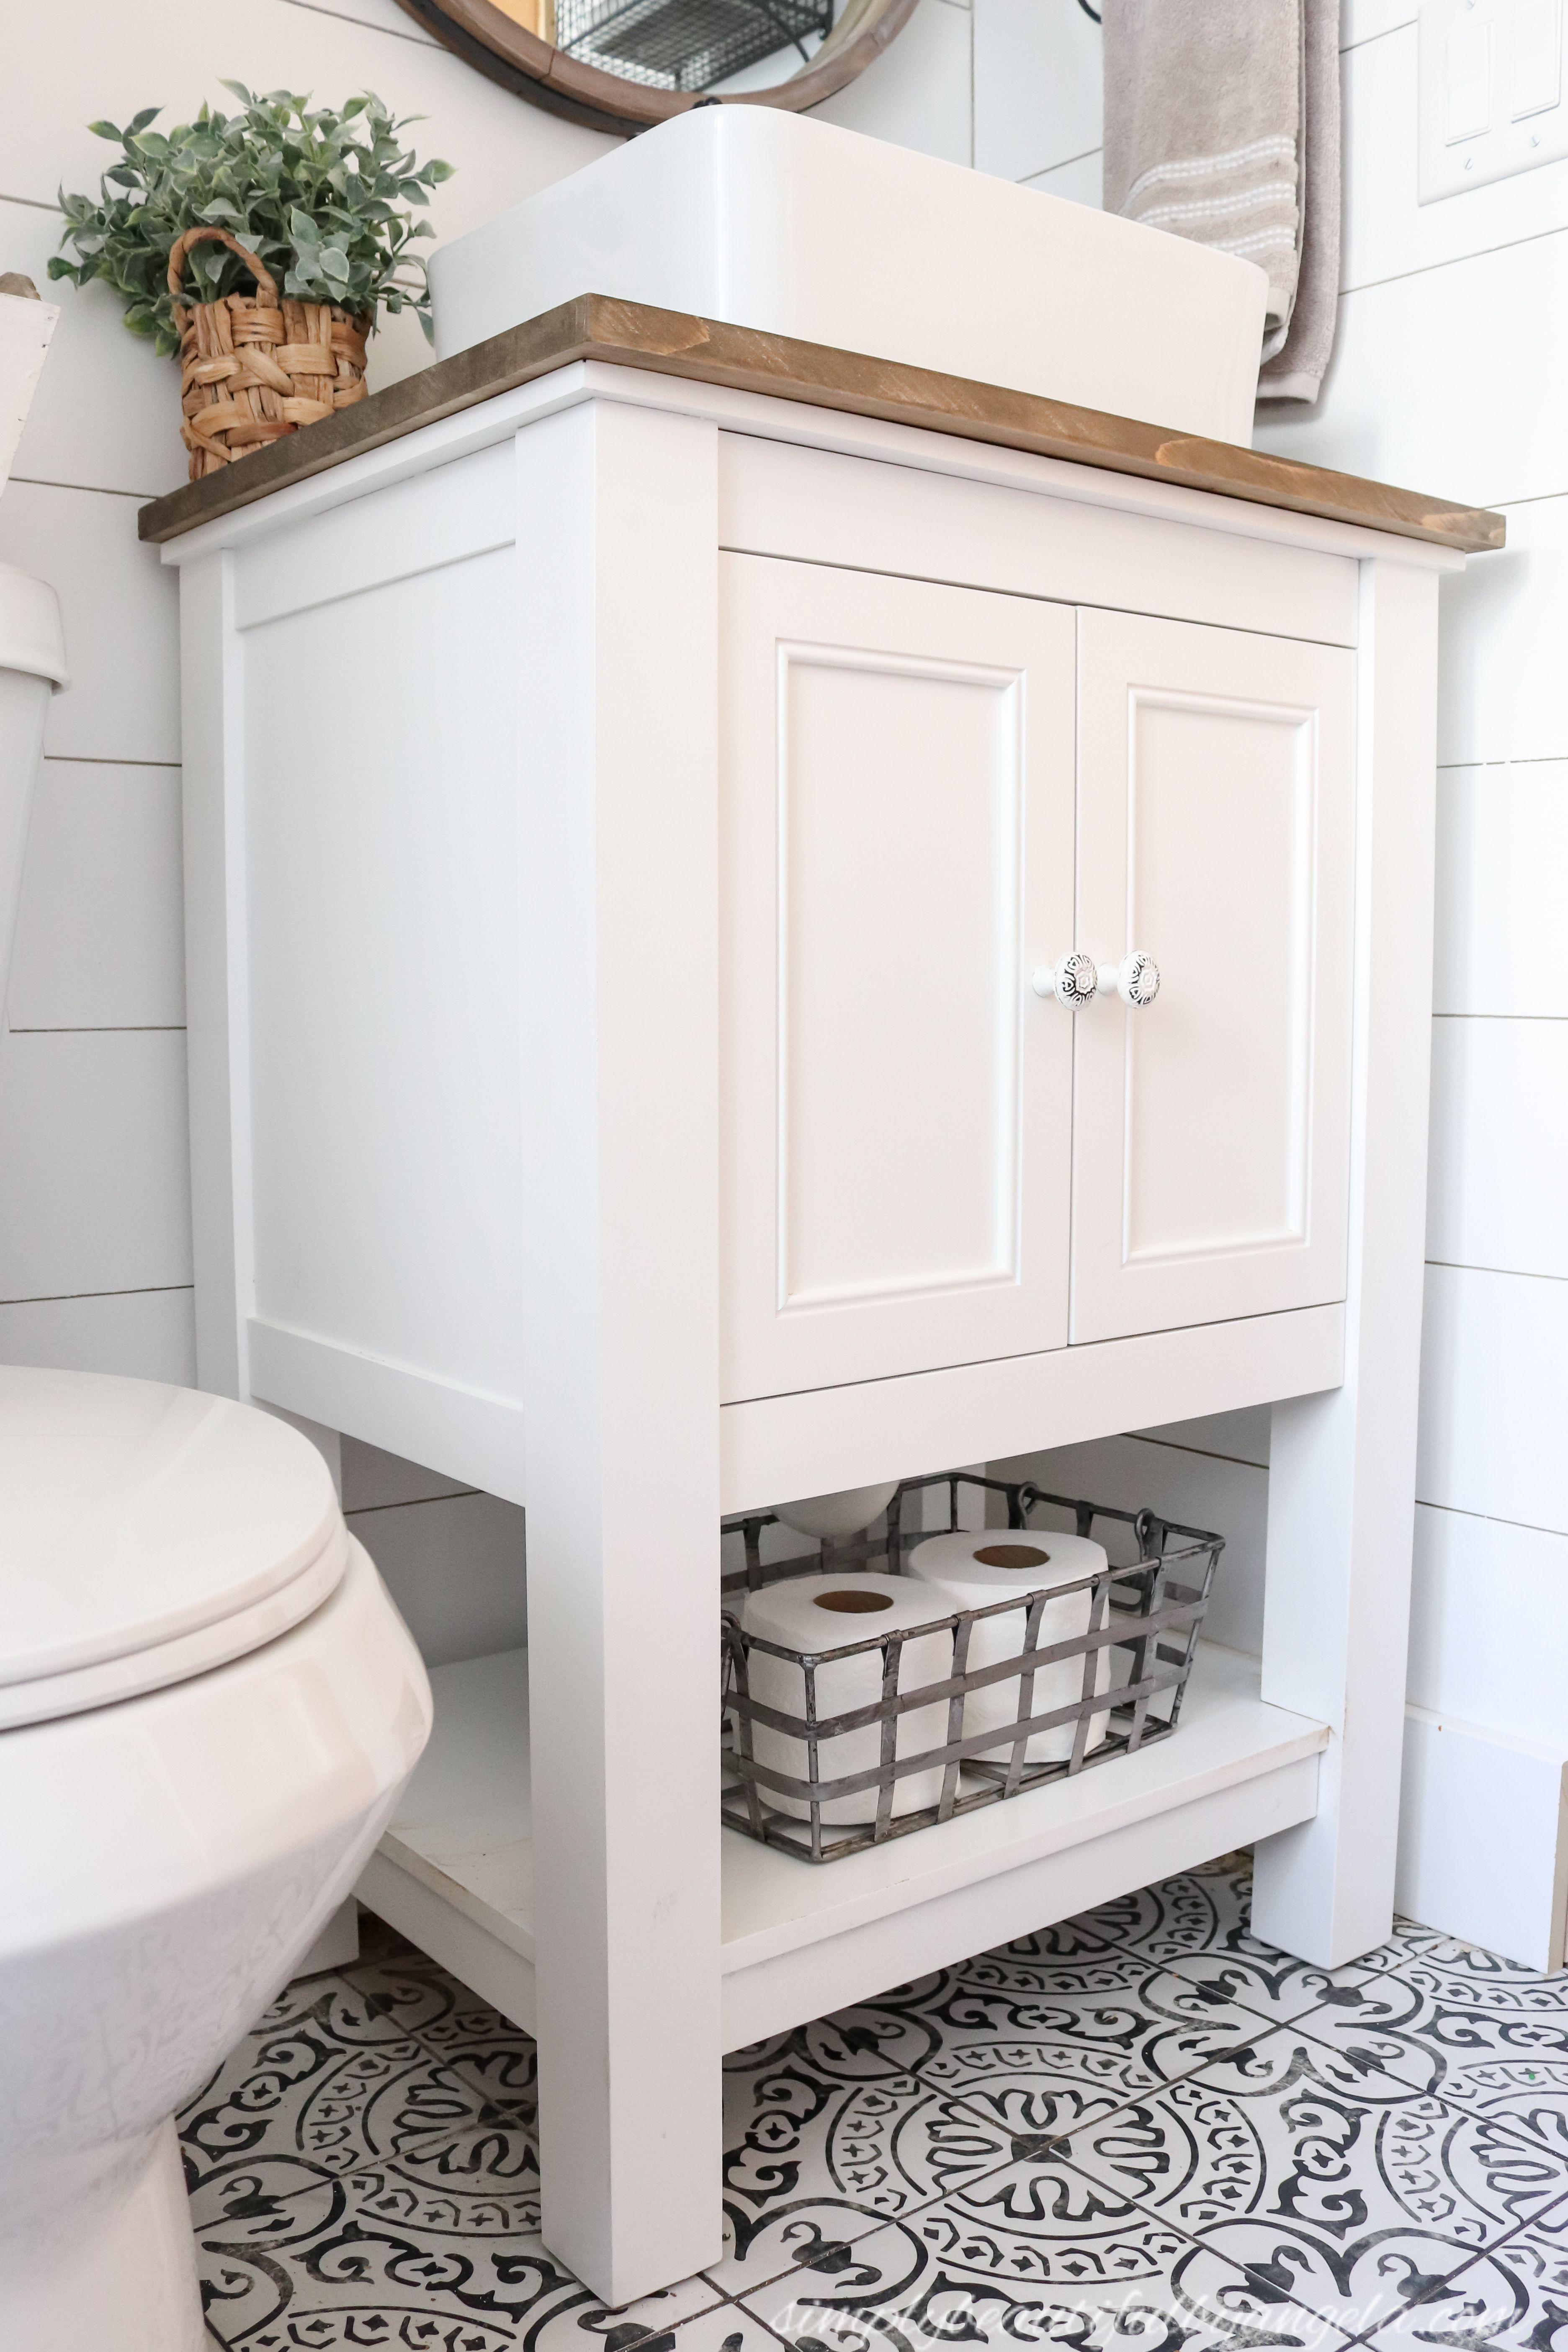 Adore Wood On White But Would Want A Recessed Sink Small Bathroom Sinks Small Bathroom Vanities Vessel Sink Bathroom Vanity [ 5617 x 3745 Pixel ]